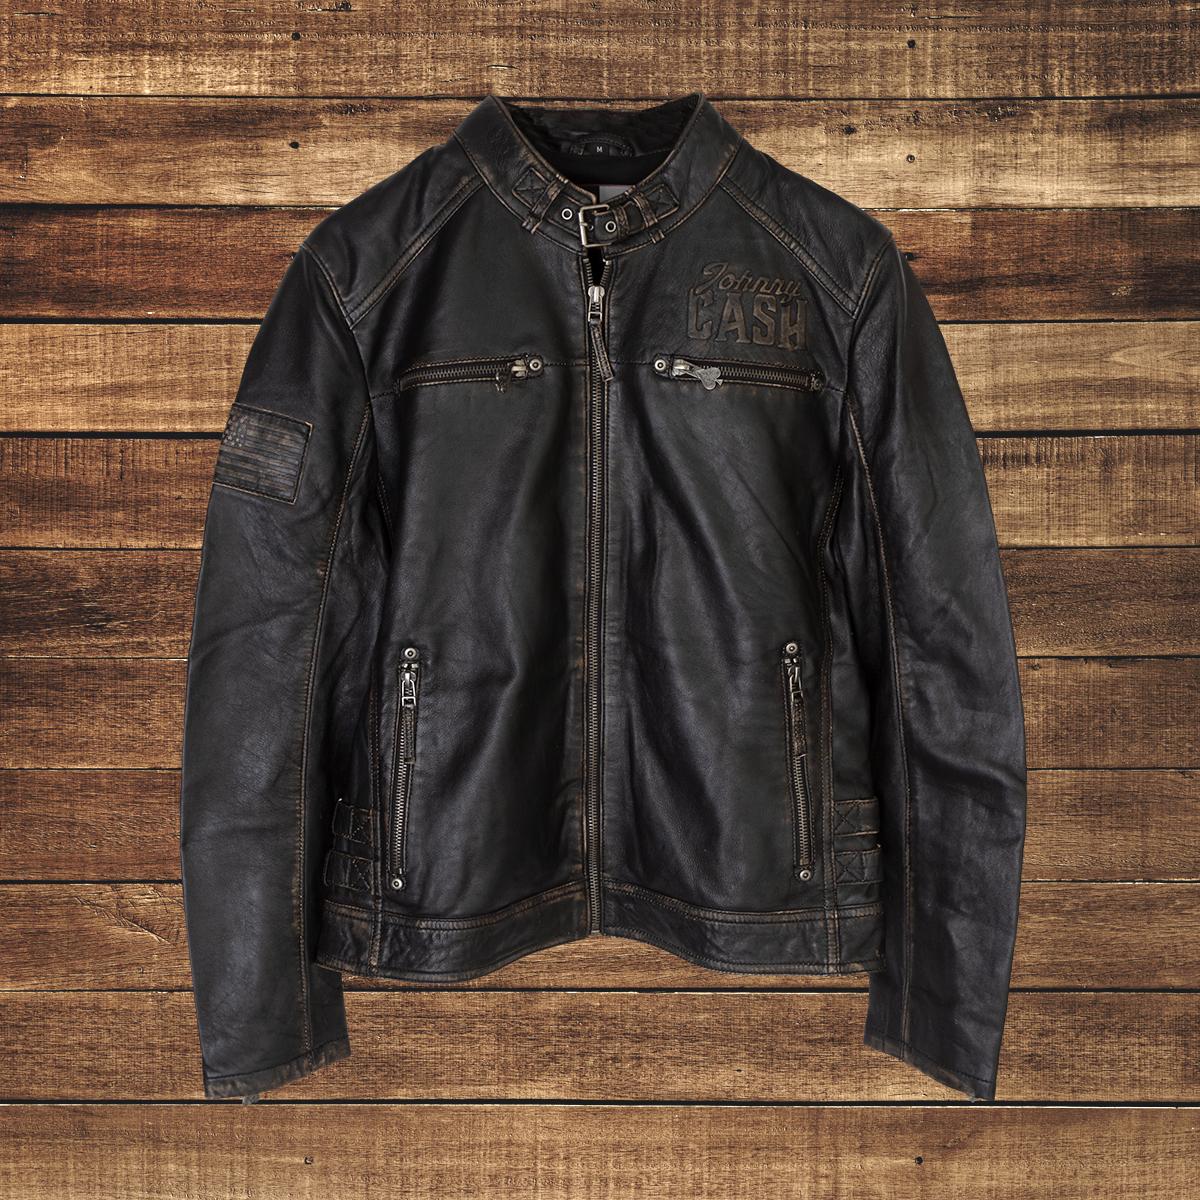 EMP JC Ace of Spades Black Leather Jacket